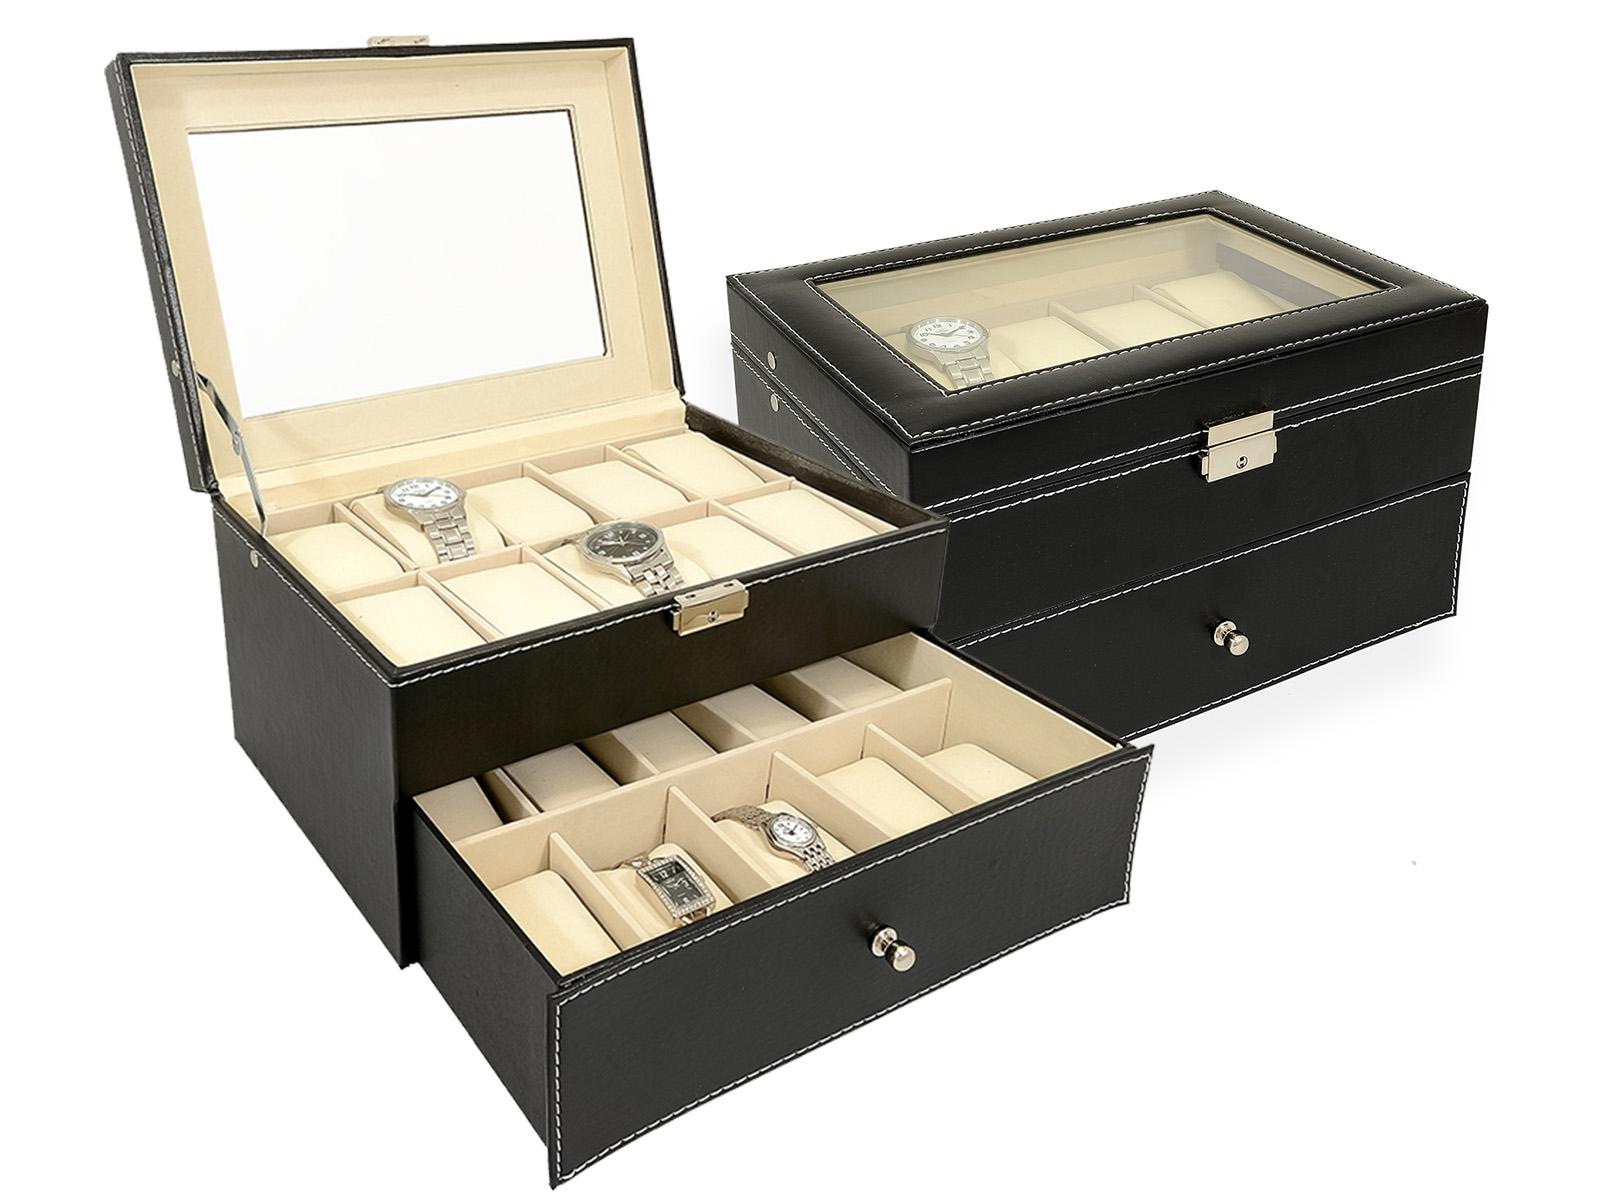 Šperkovnice na hodinky a náramky černá SVK1138